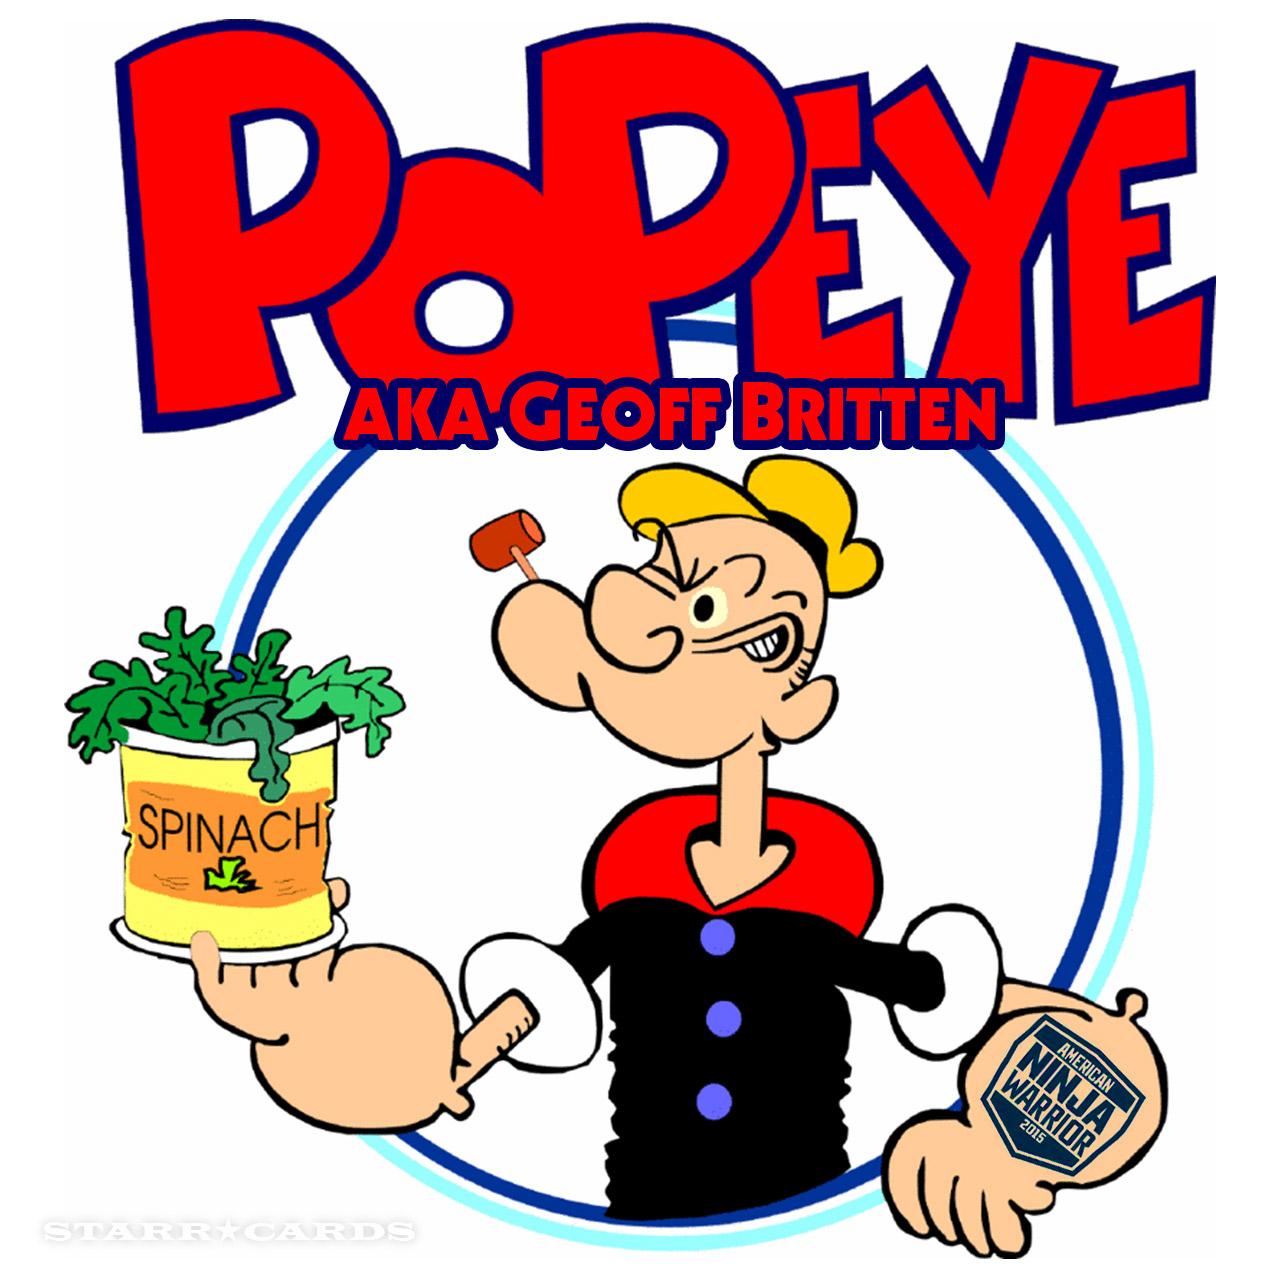 Popeye aka Geoff Britten stars on 'American Ninja Warrior'